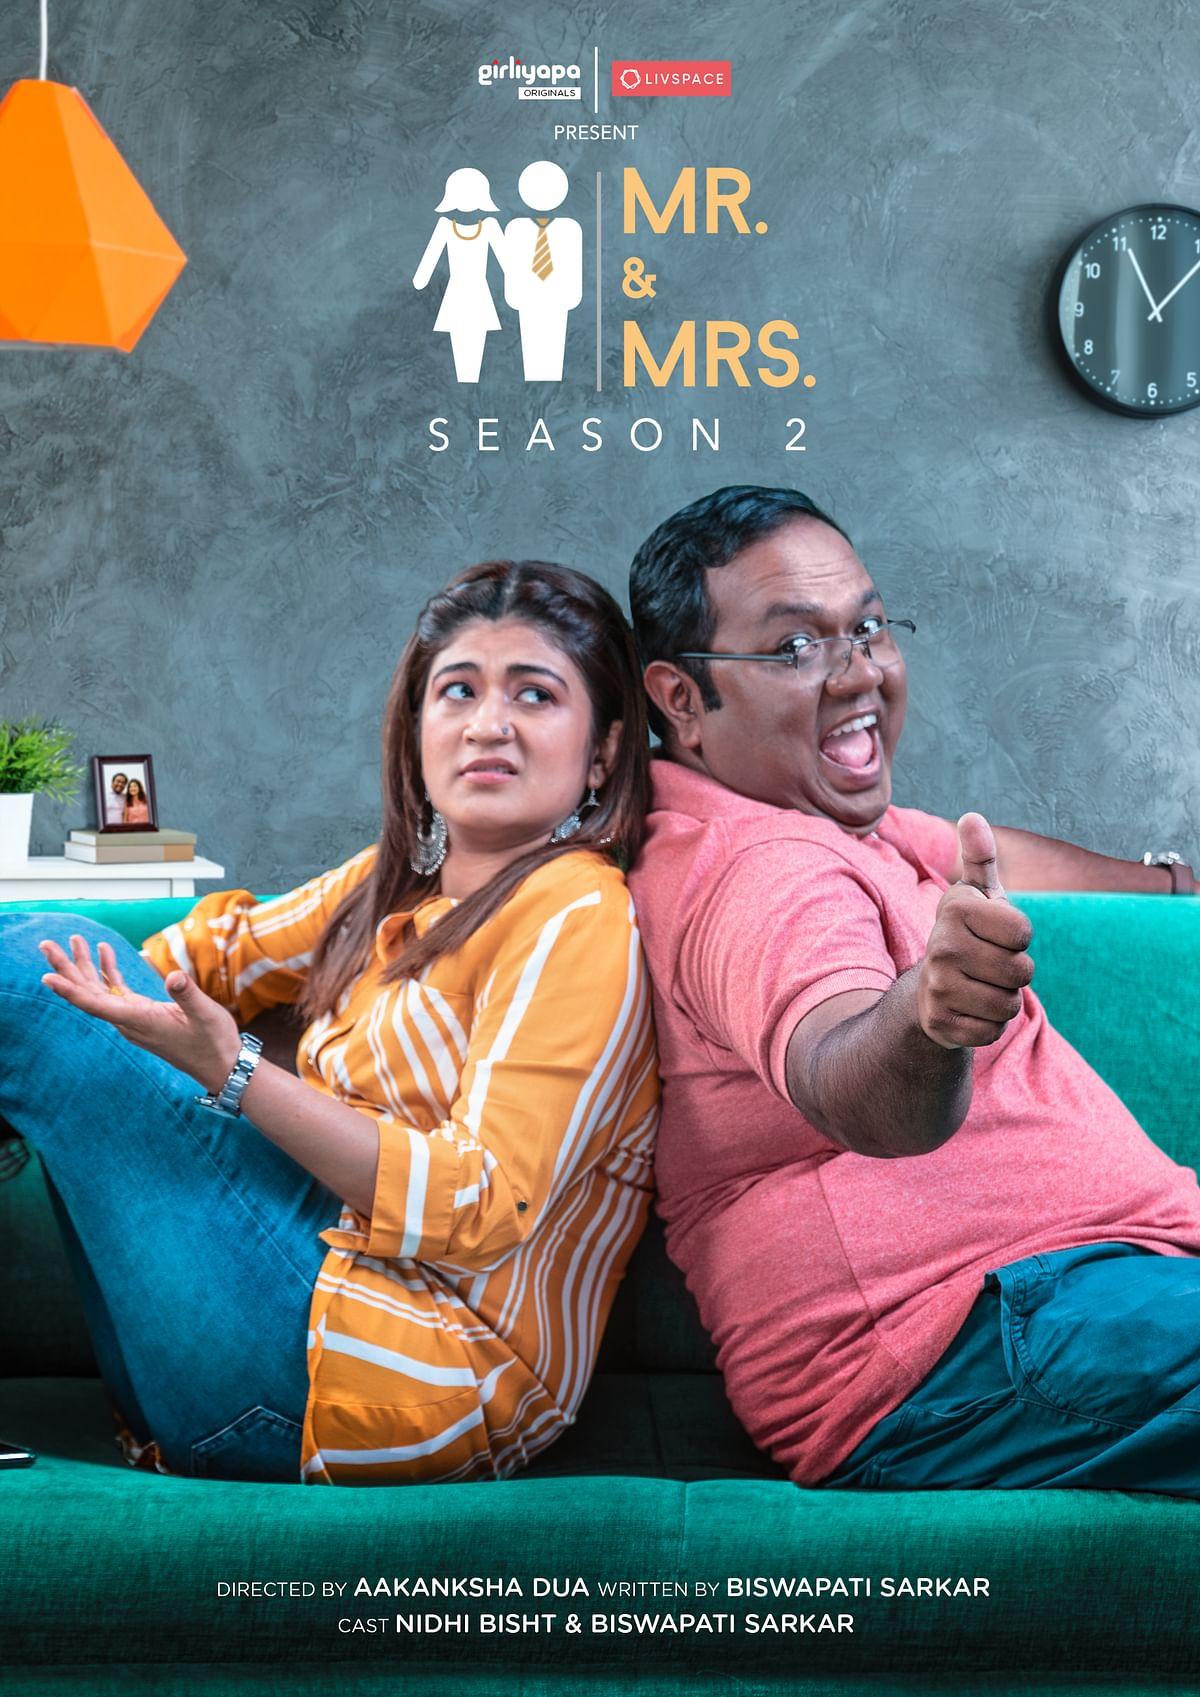 Livspace partners with Girliyapa's Mr. & Mrs. Season 2